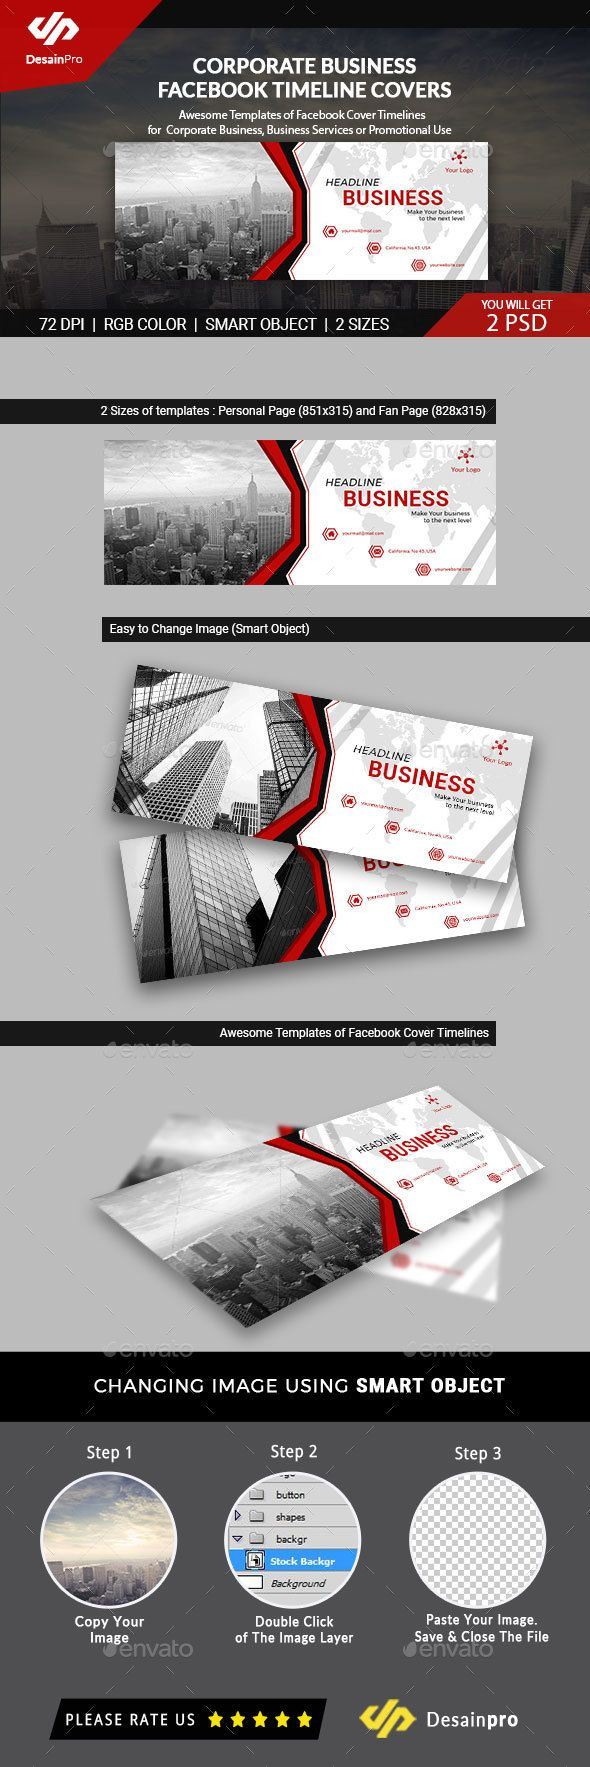 Corporate Business FB Timeline Cover - AR - Facebook Timeline Covers Social Media